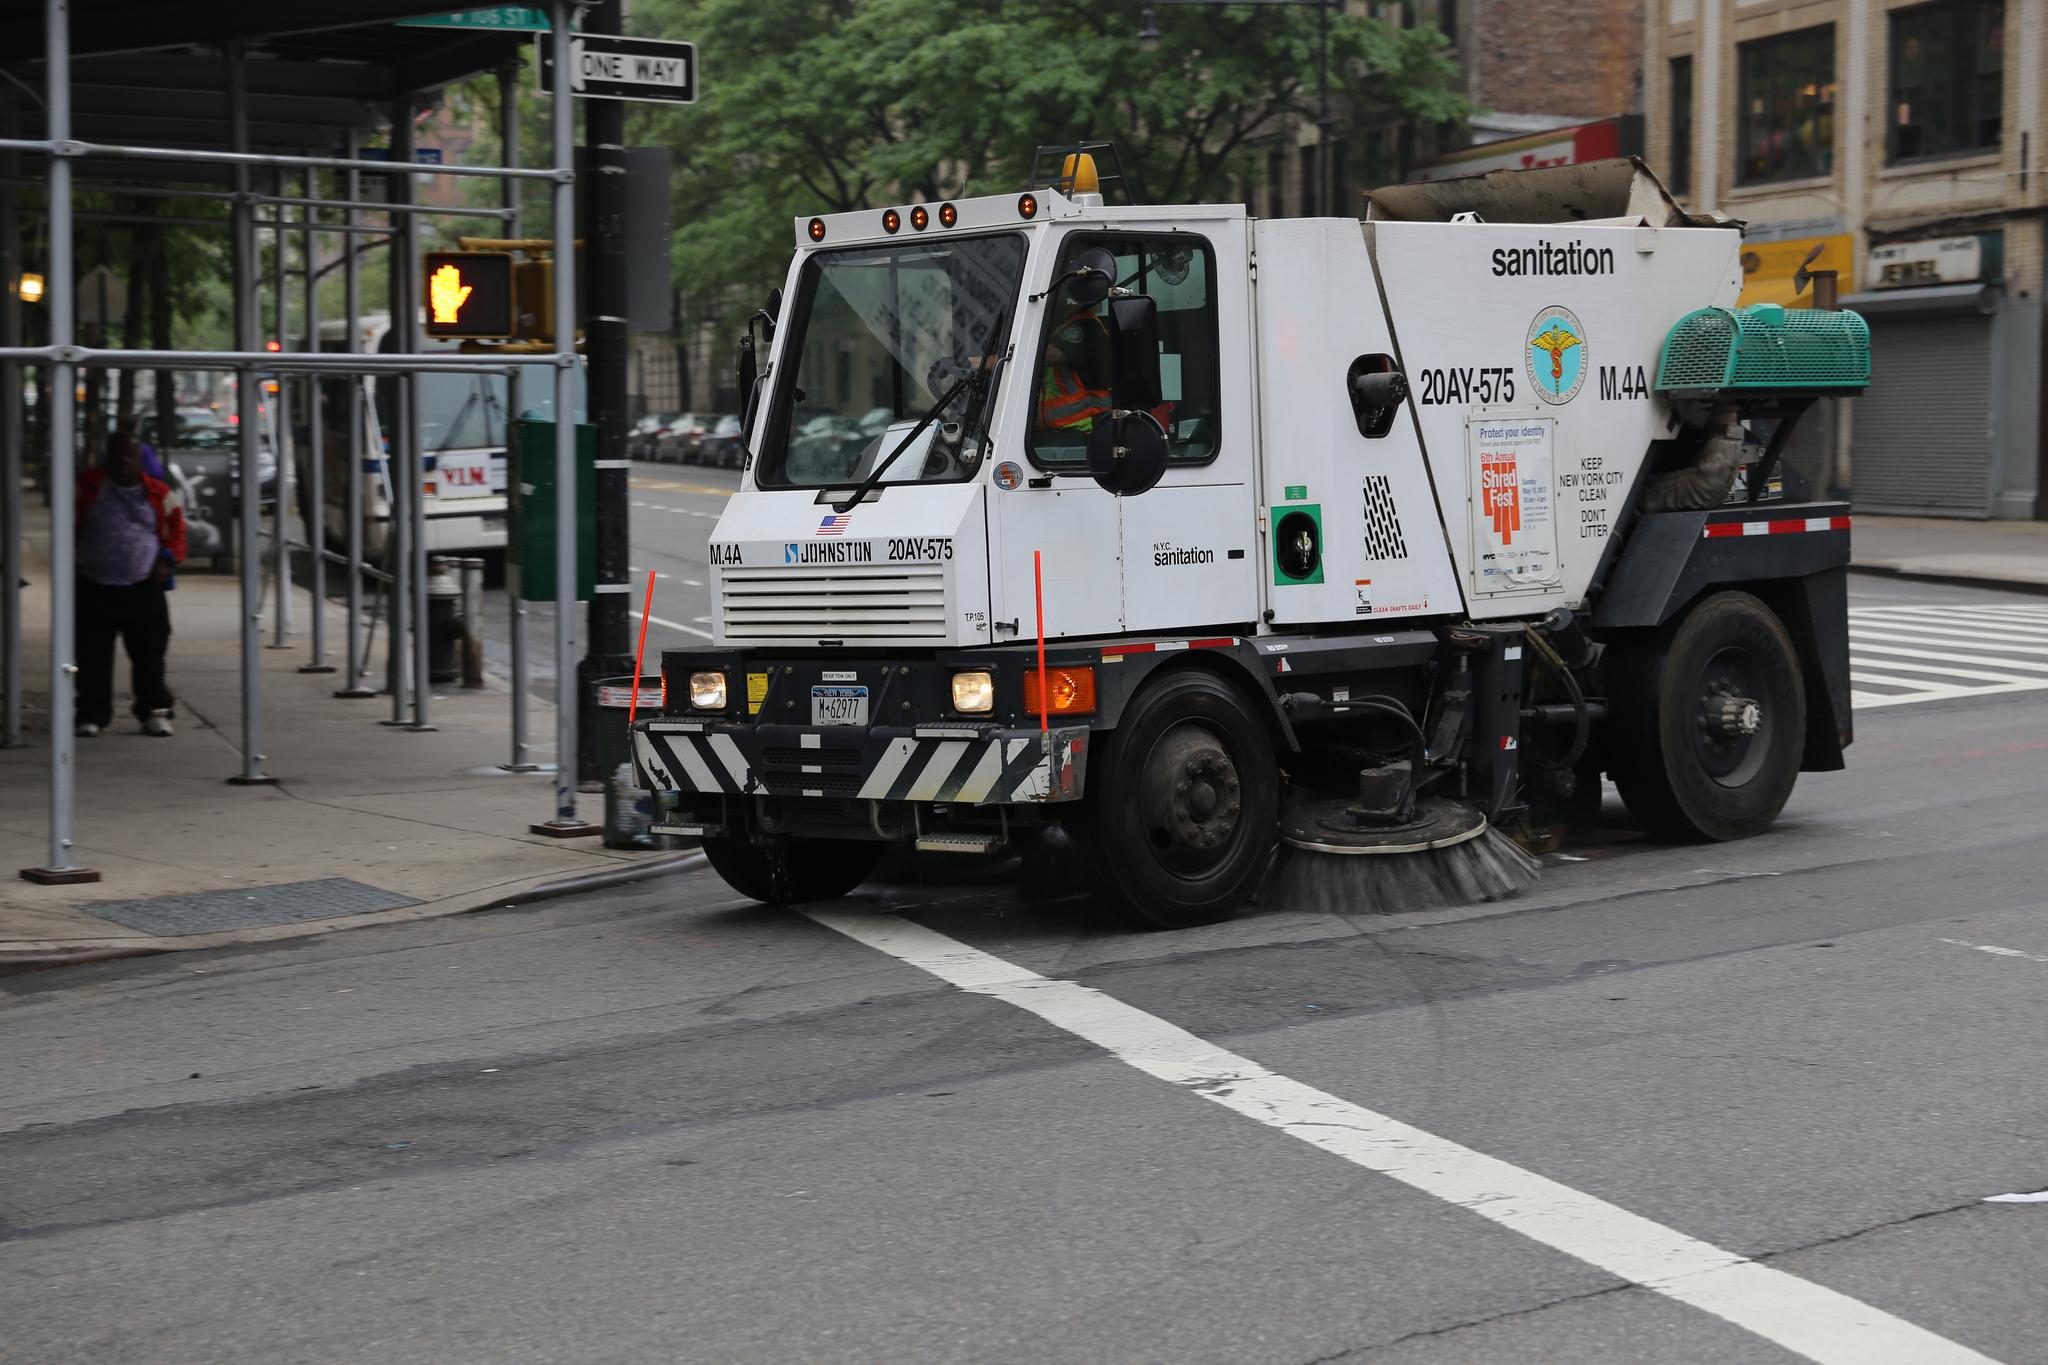 A New York City street sweeper struck Bailey. Photo by Vetatur Fumar